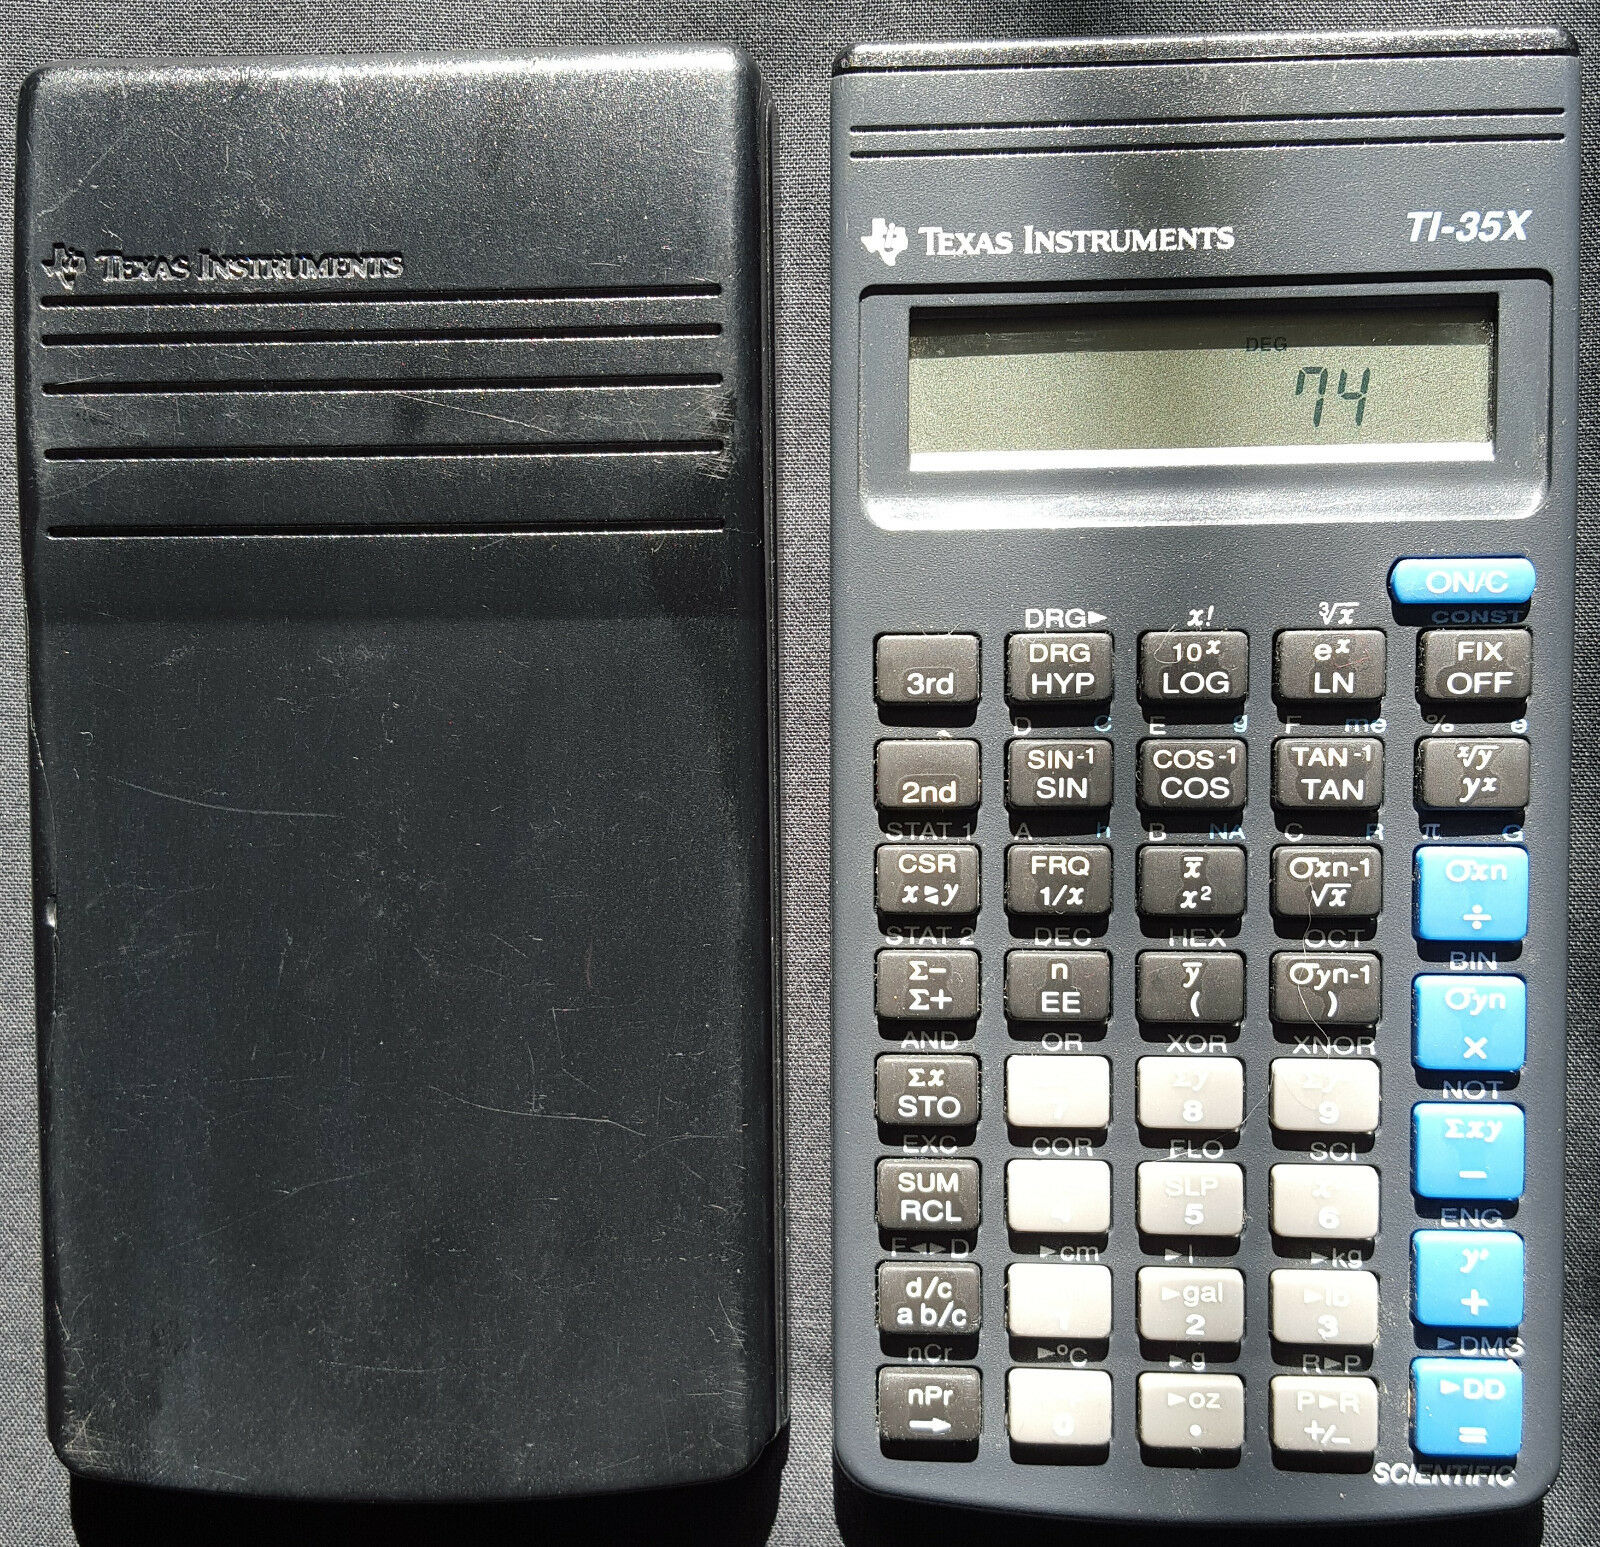 Texas Instruments TI-35X Scientific Calculator